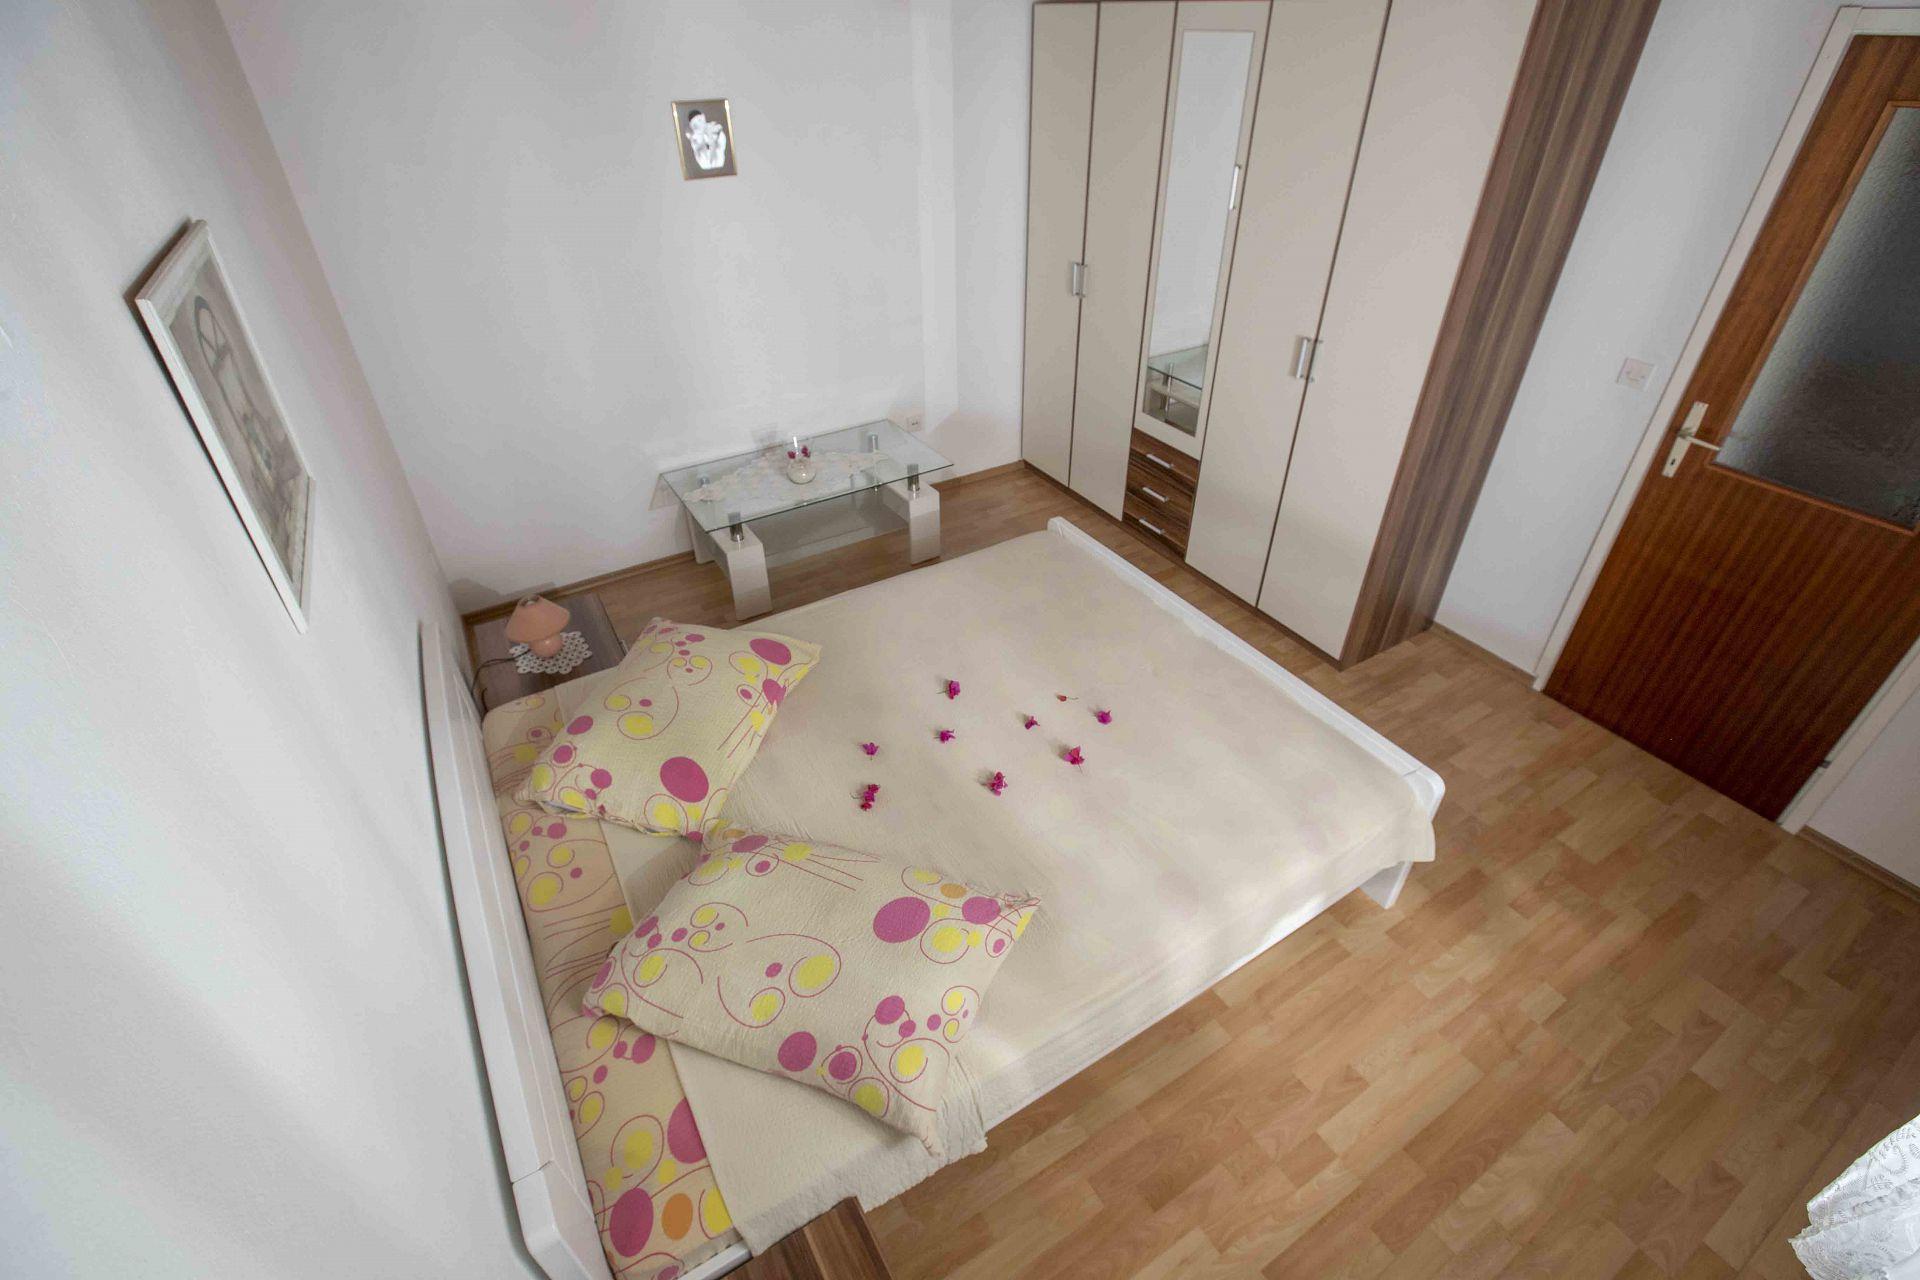 00603ZAVA - Zavala - Appartementen Kroatië - Meri(4): slaapkamer